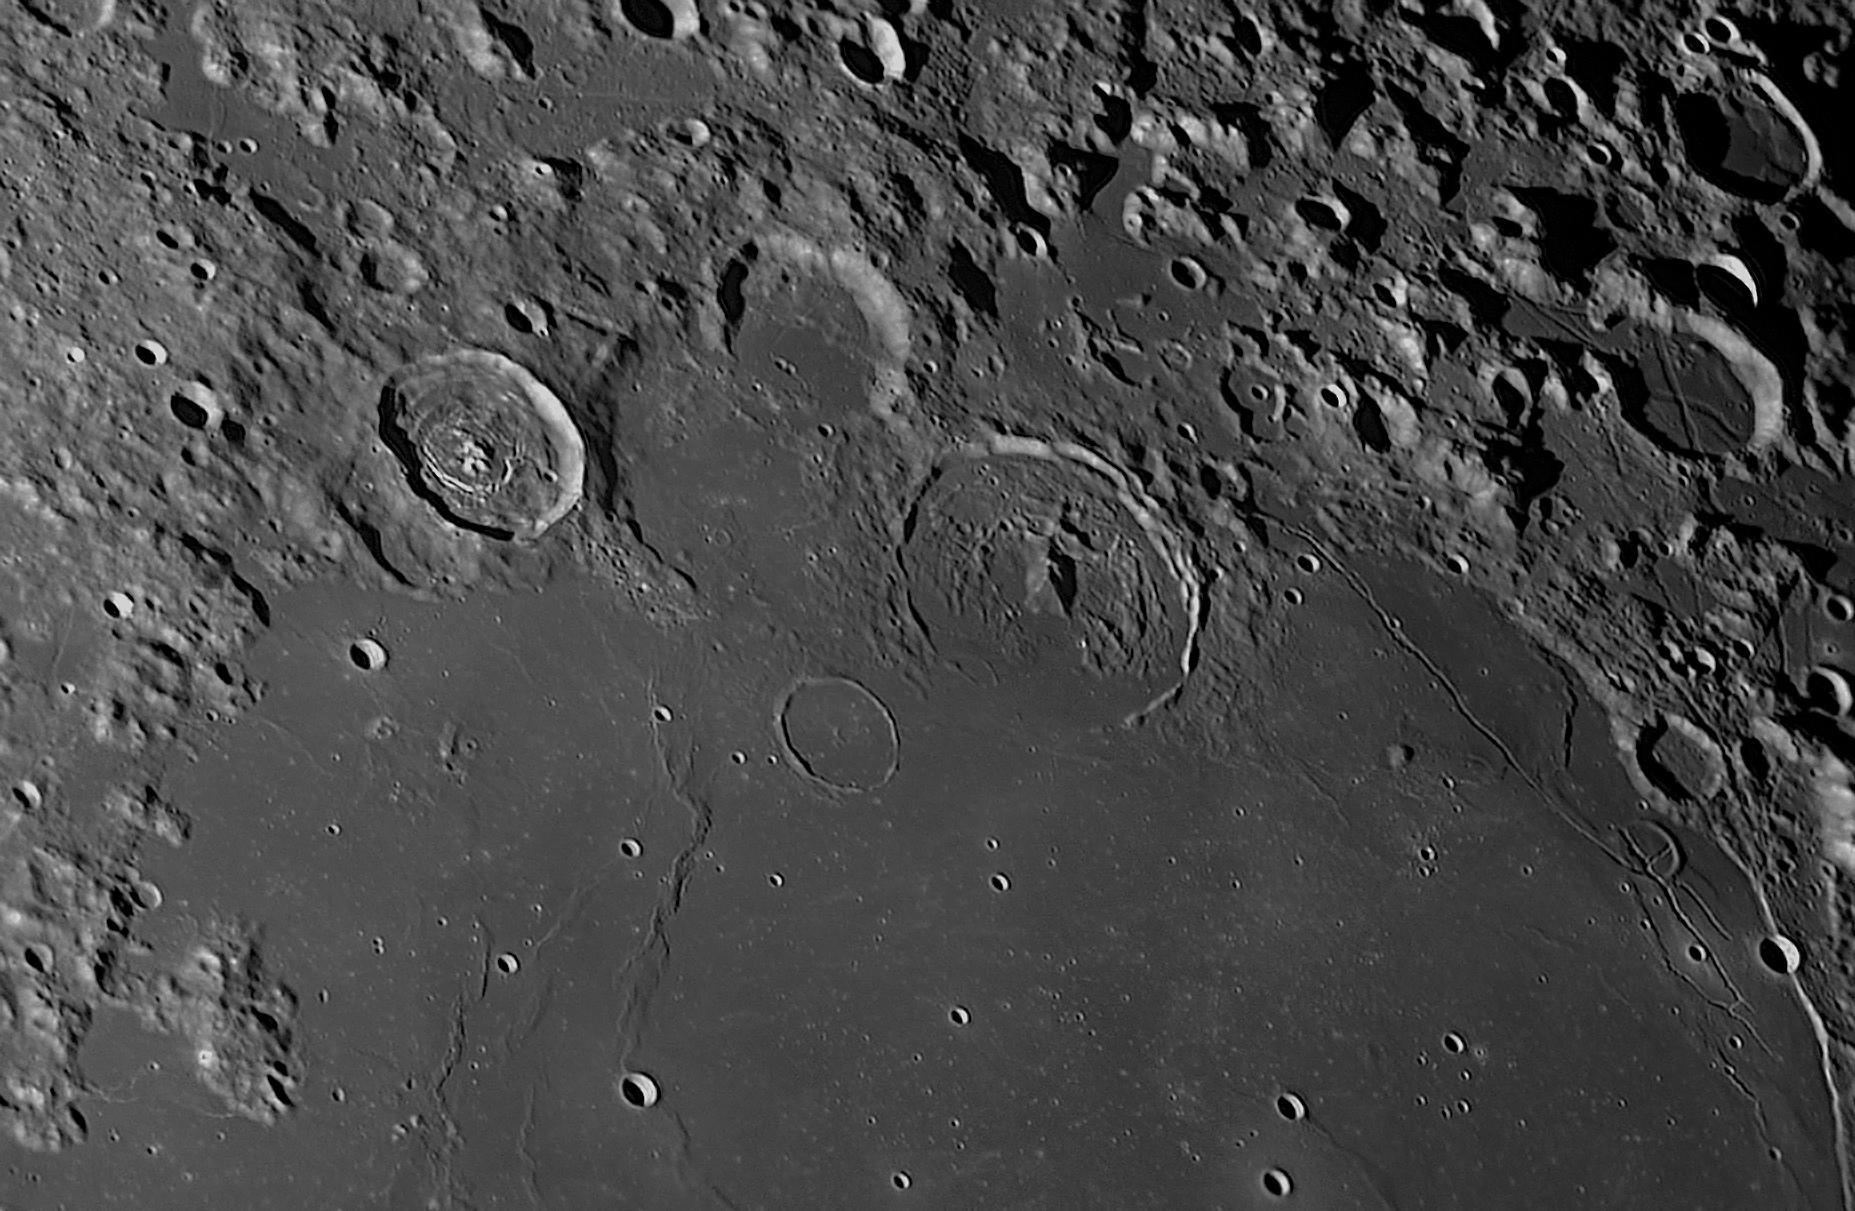 2021-02-23-2135_8-R-Moon_Vitello_D.jpg.a6c77f33c1393eb3dc2635bee233670b.jpg